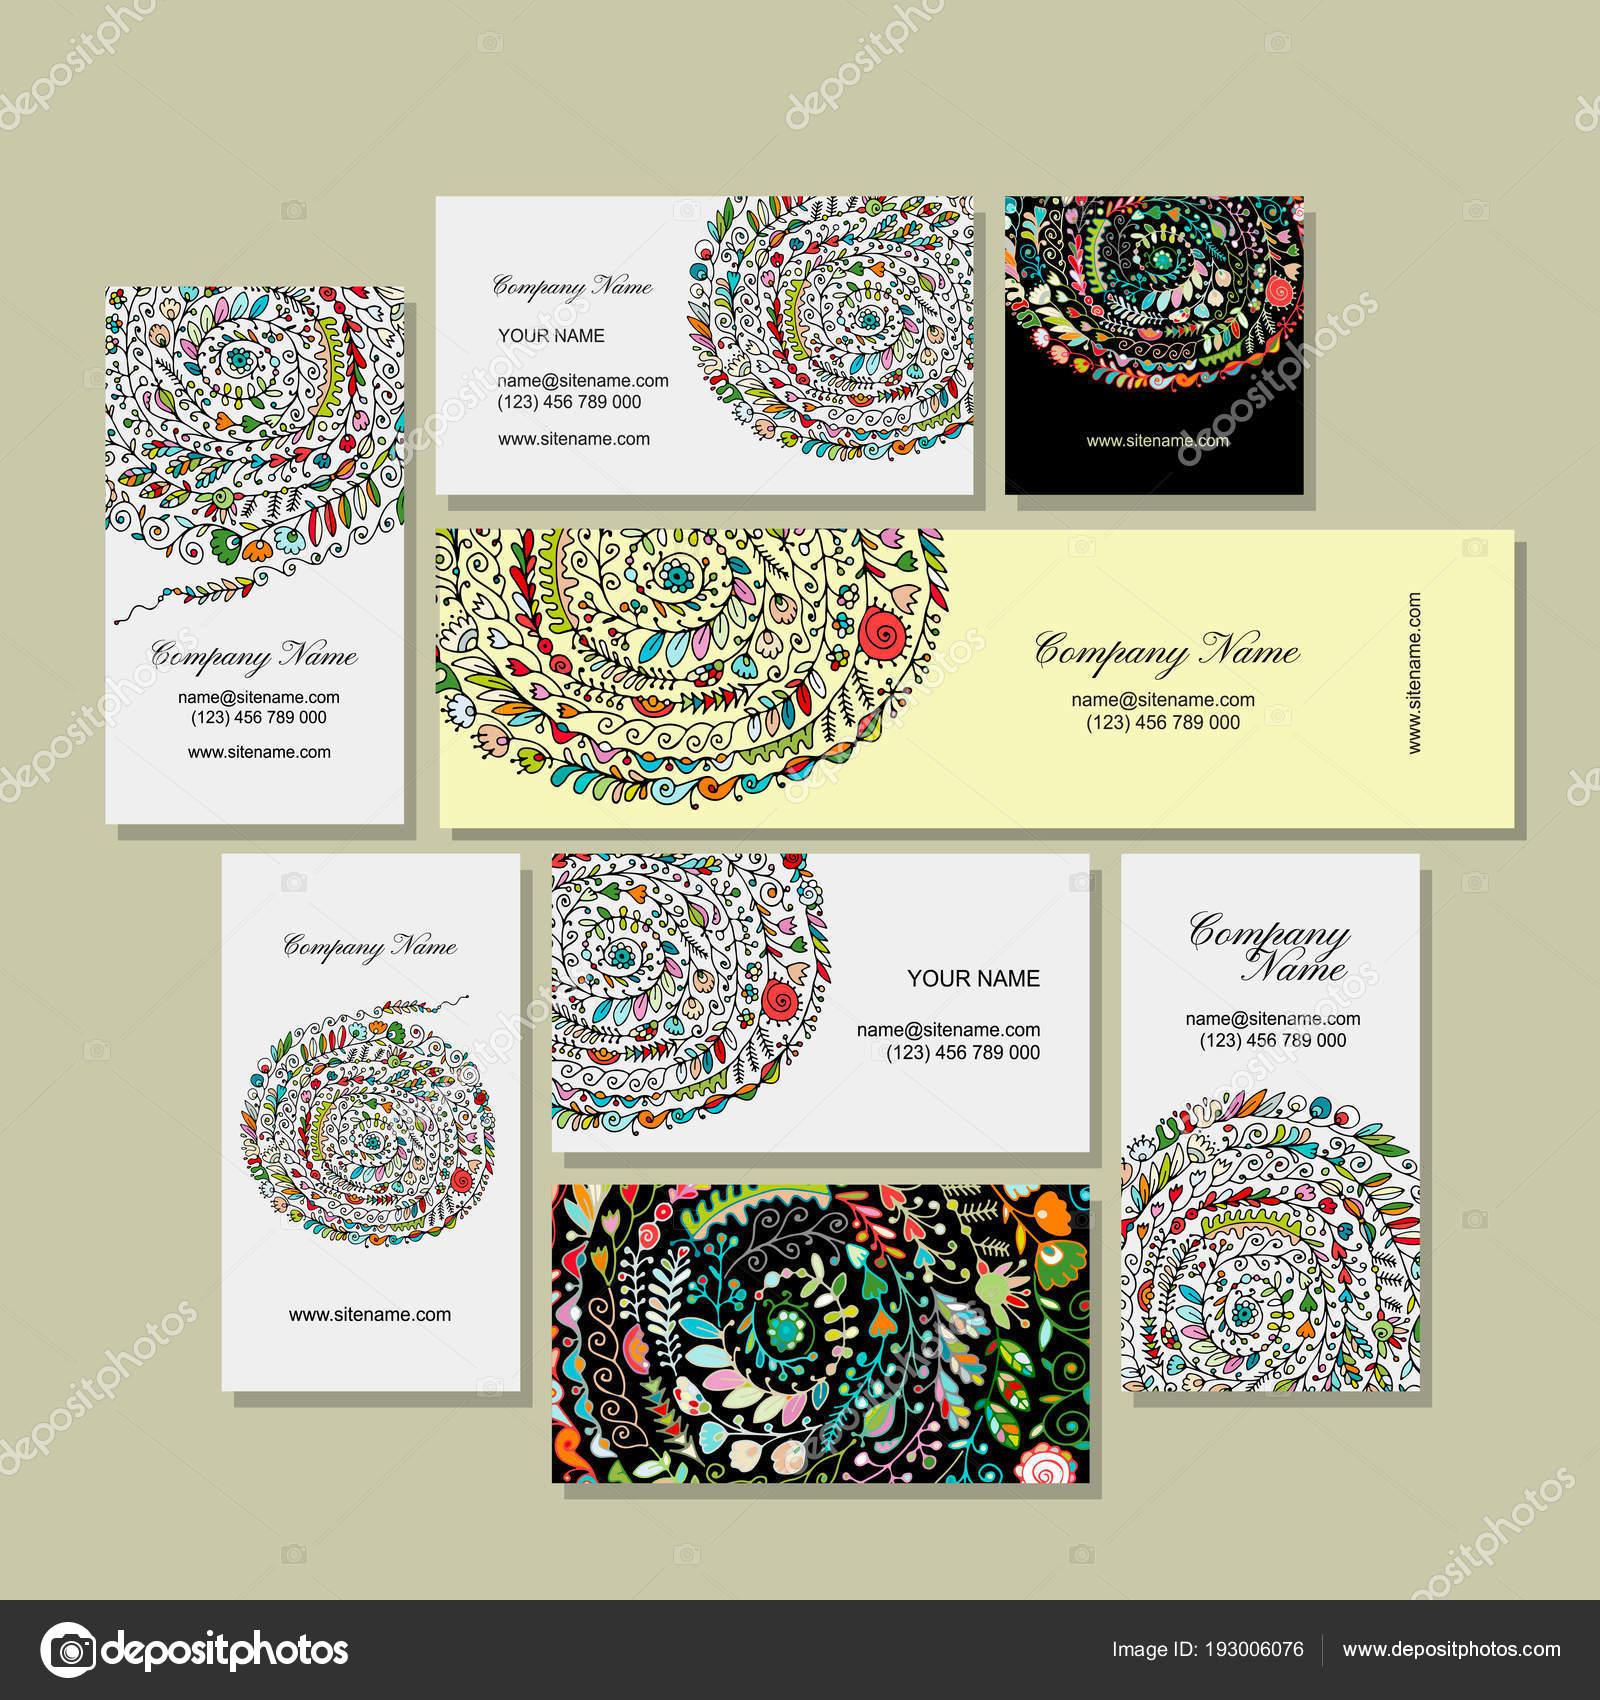 Visitenkarten Design Floraler Hintergrund Stockvektor